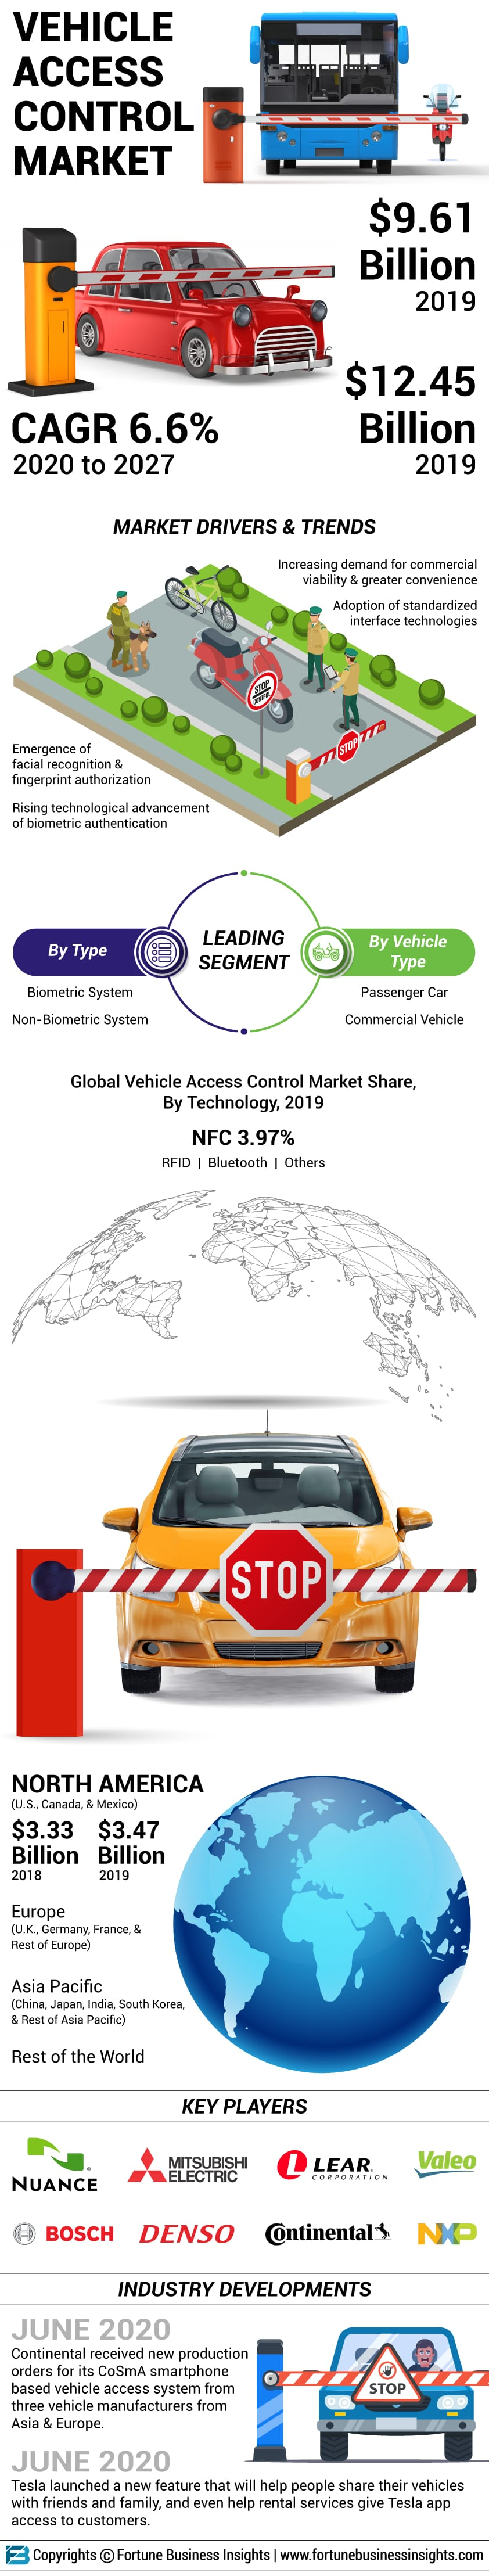 Vehicle Access Control Market